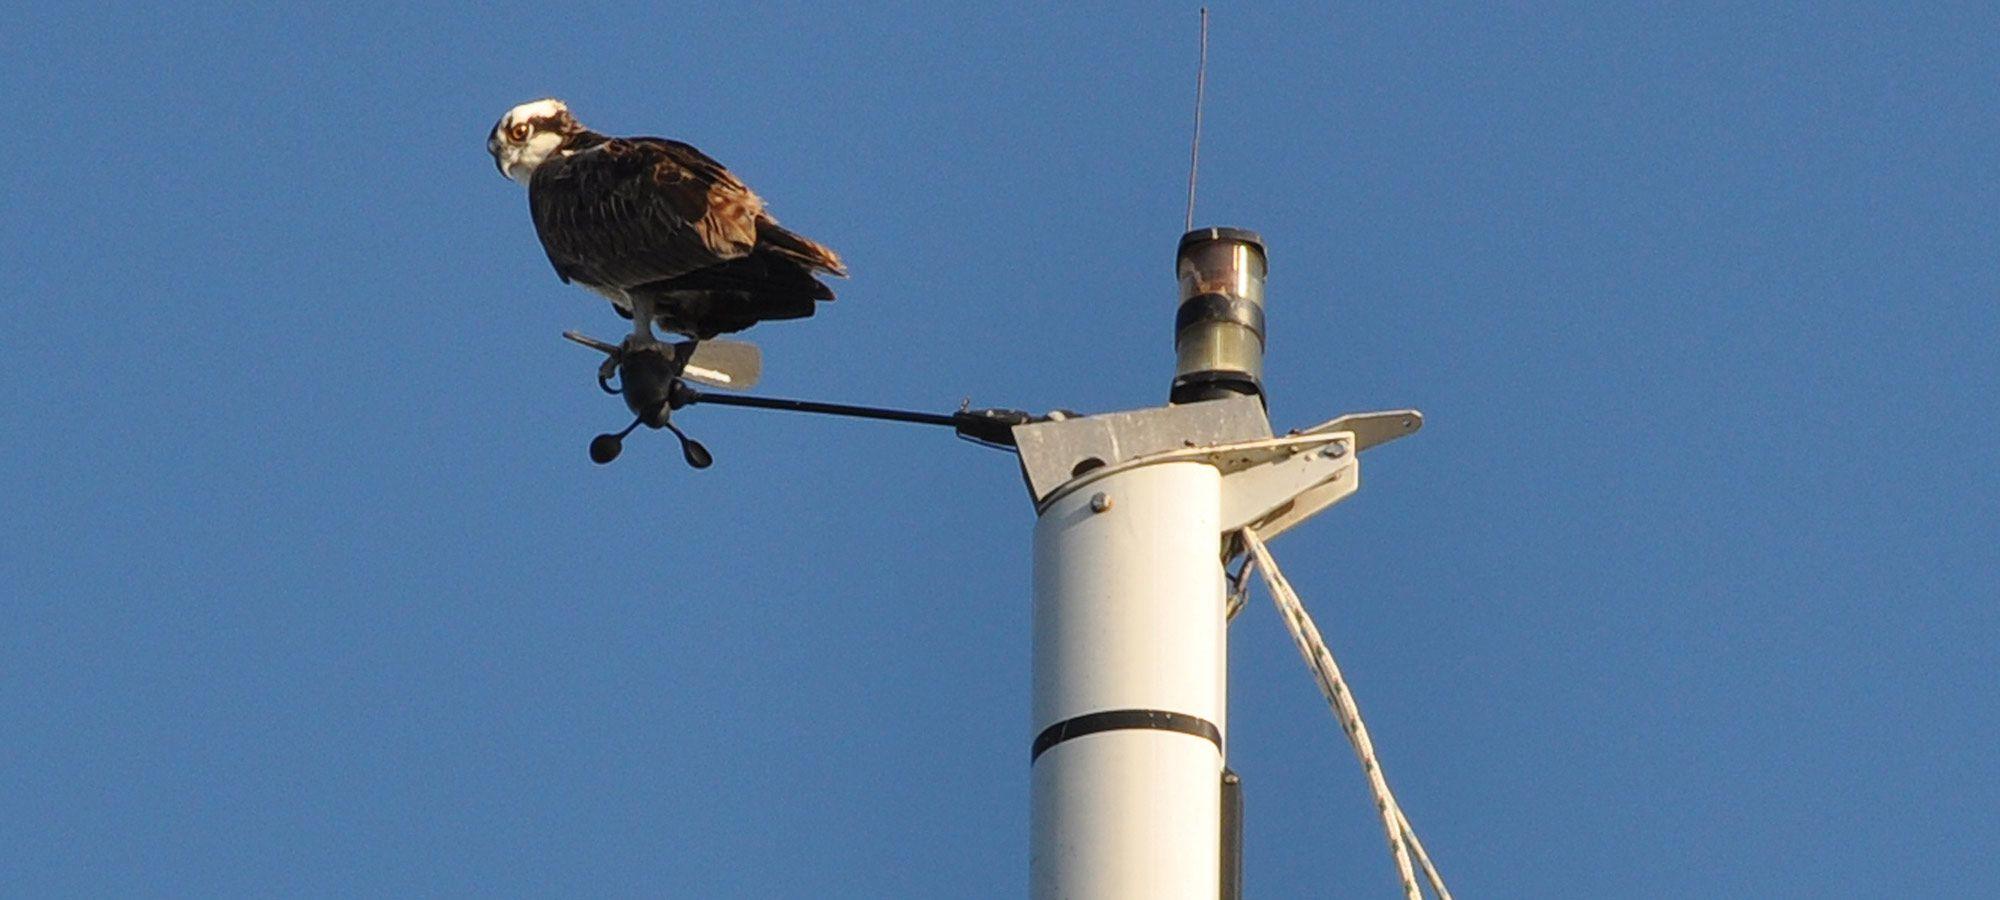 Bird Deterrents for Sailboats